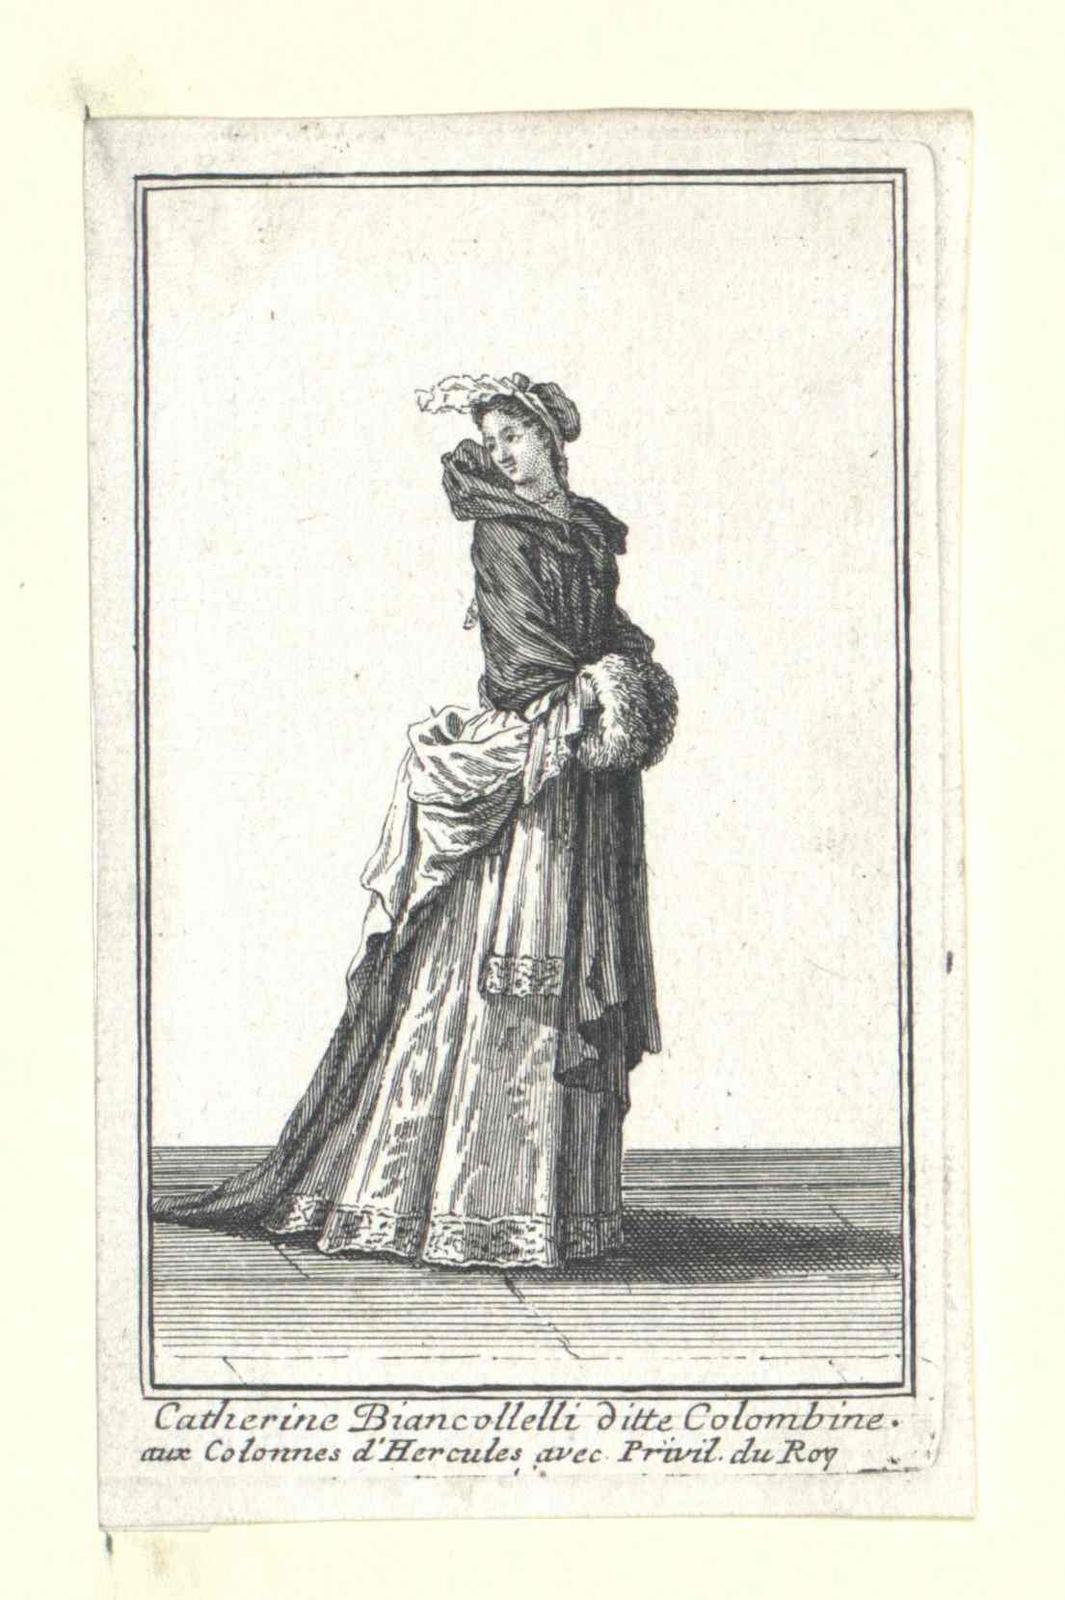 Caterina Bianconelli